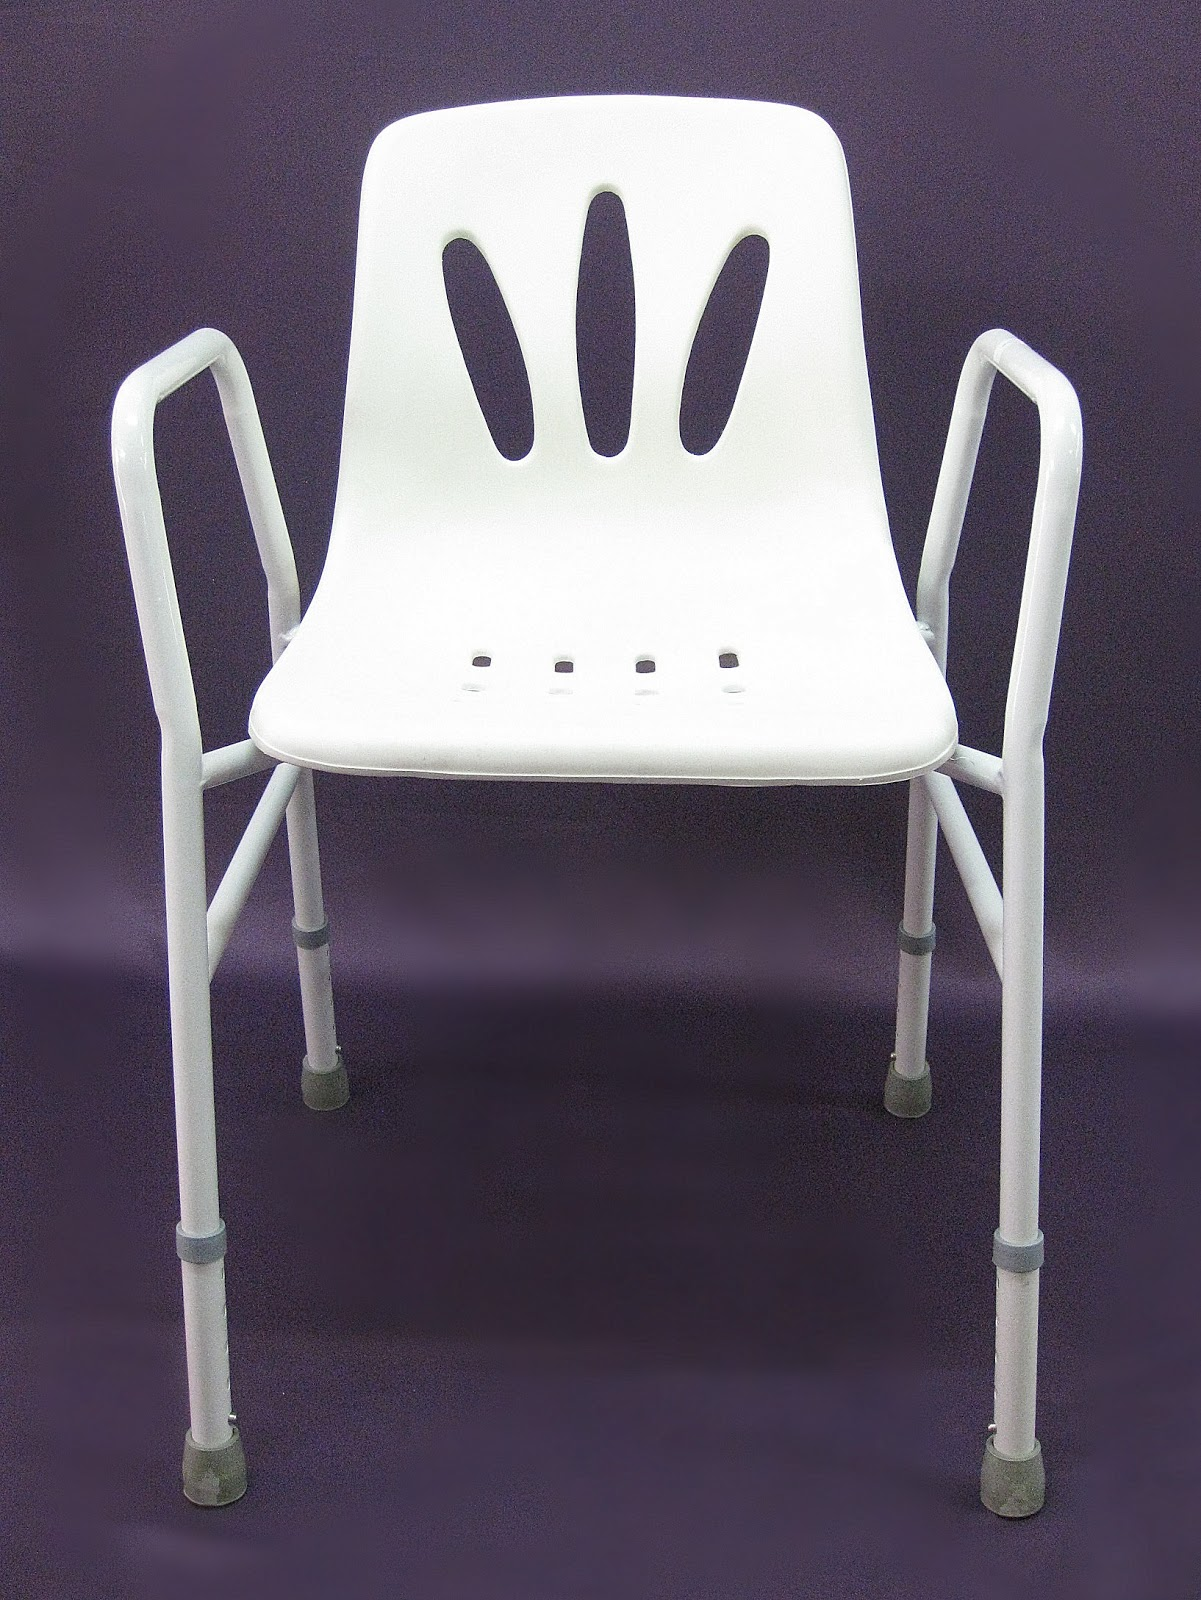 Shower Chair Malaysia French Country Chairs Kerusi Mandi For Homecare Rumah Orang Tua